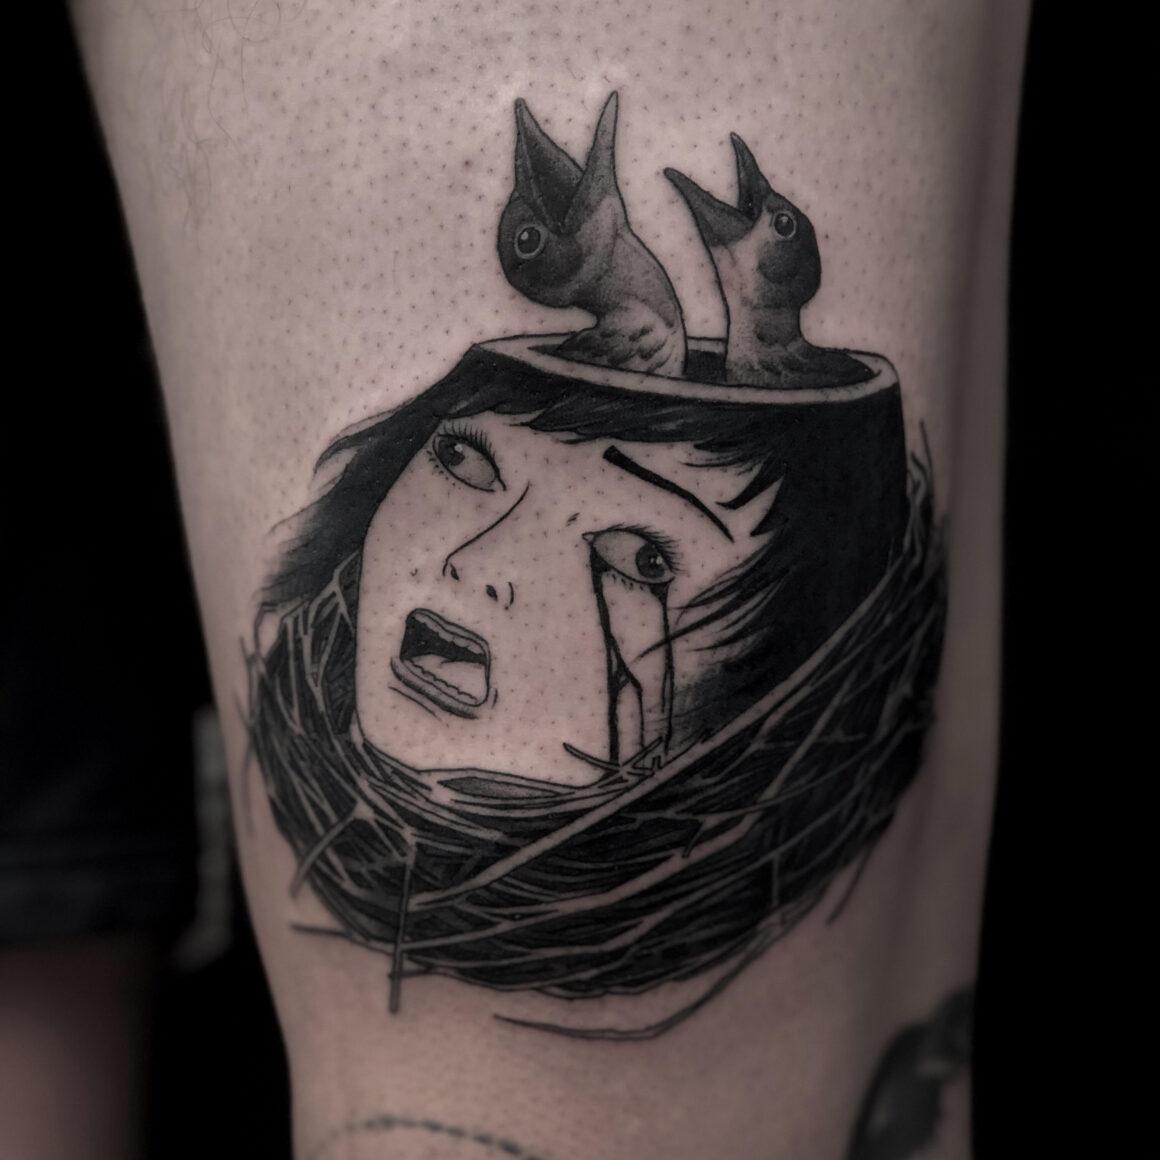 El Uf, ONDO Tattoo, Barcelona, Spain